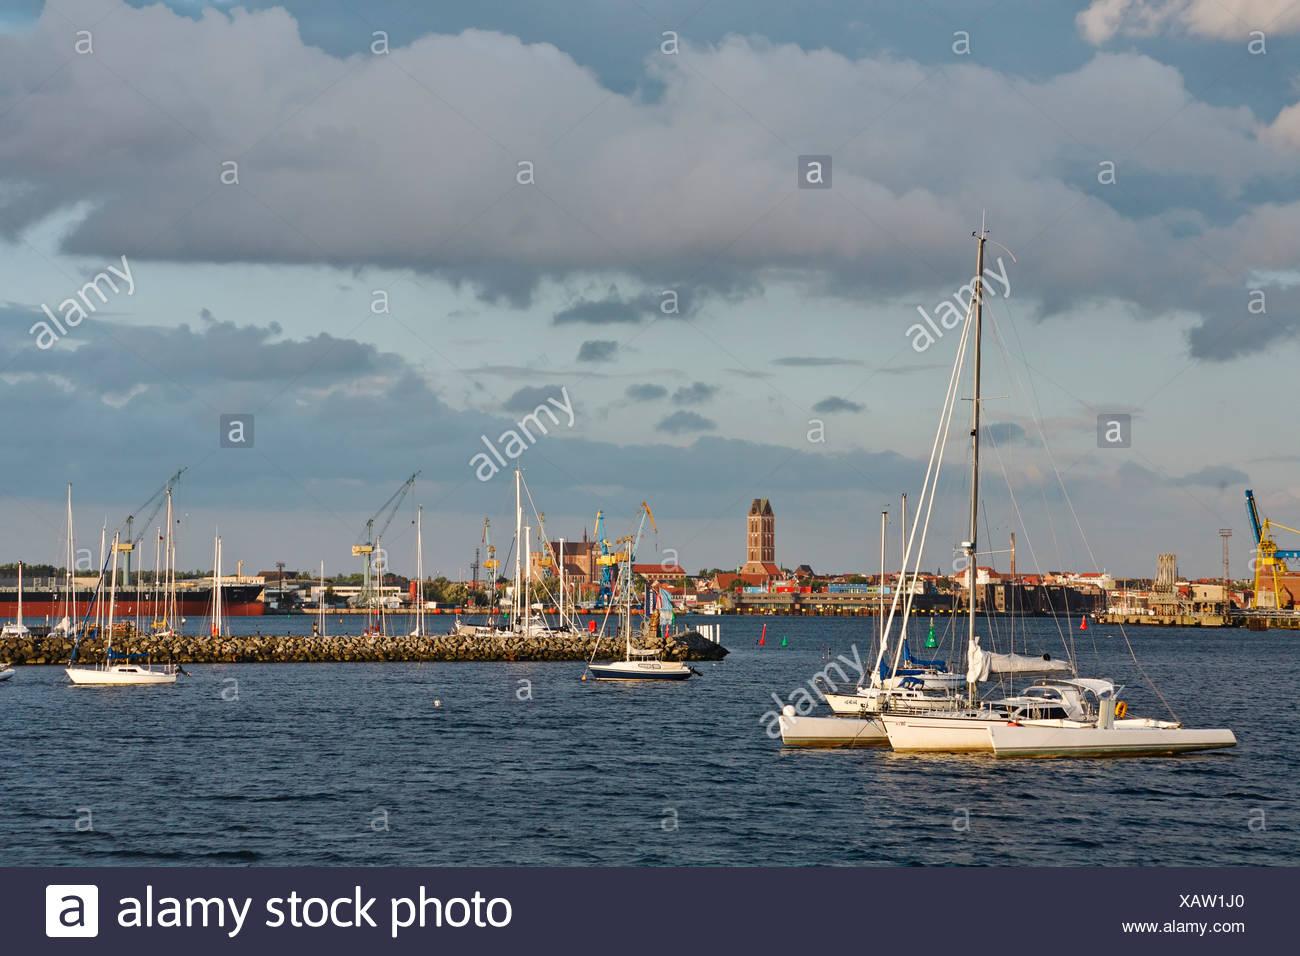 Sailboats at harbor Baltic sea Wismar Mecklenburg-Western Pomerania Germany - Stock Image